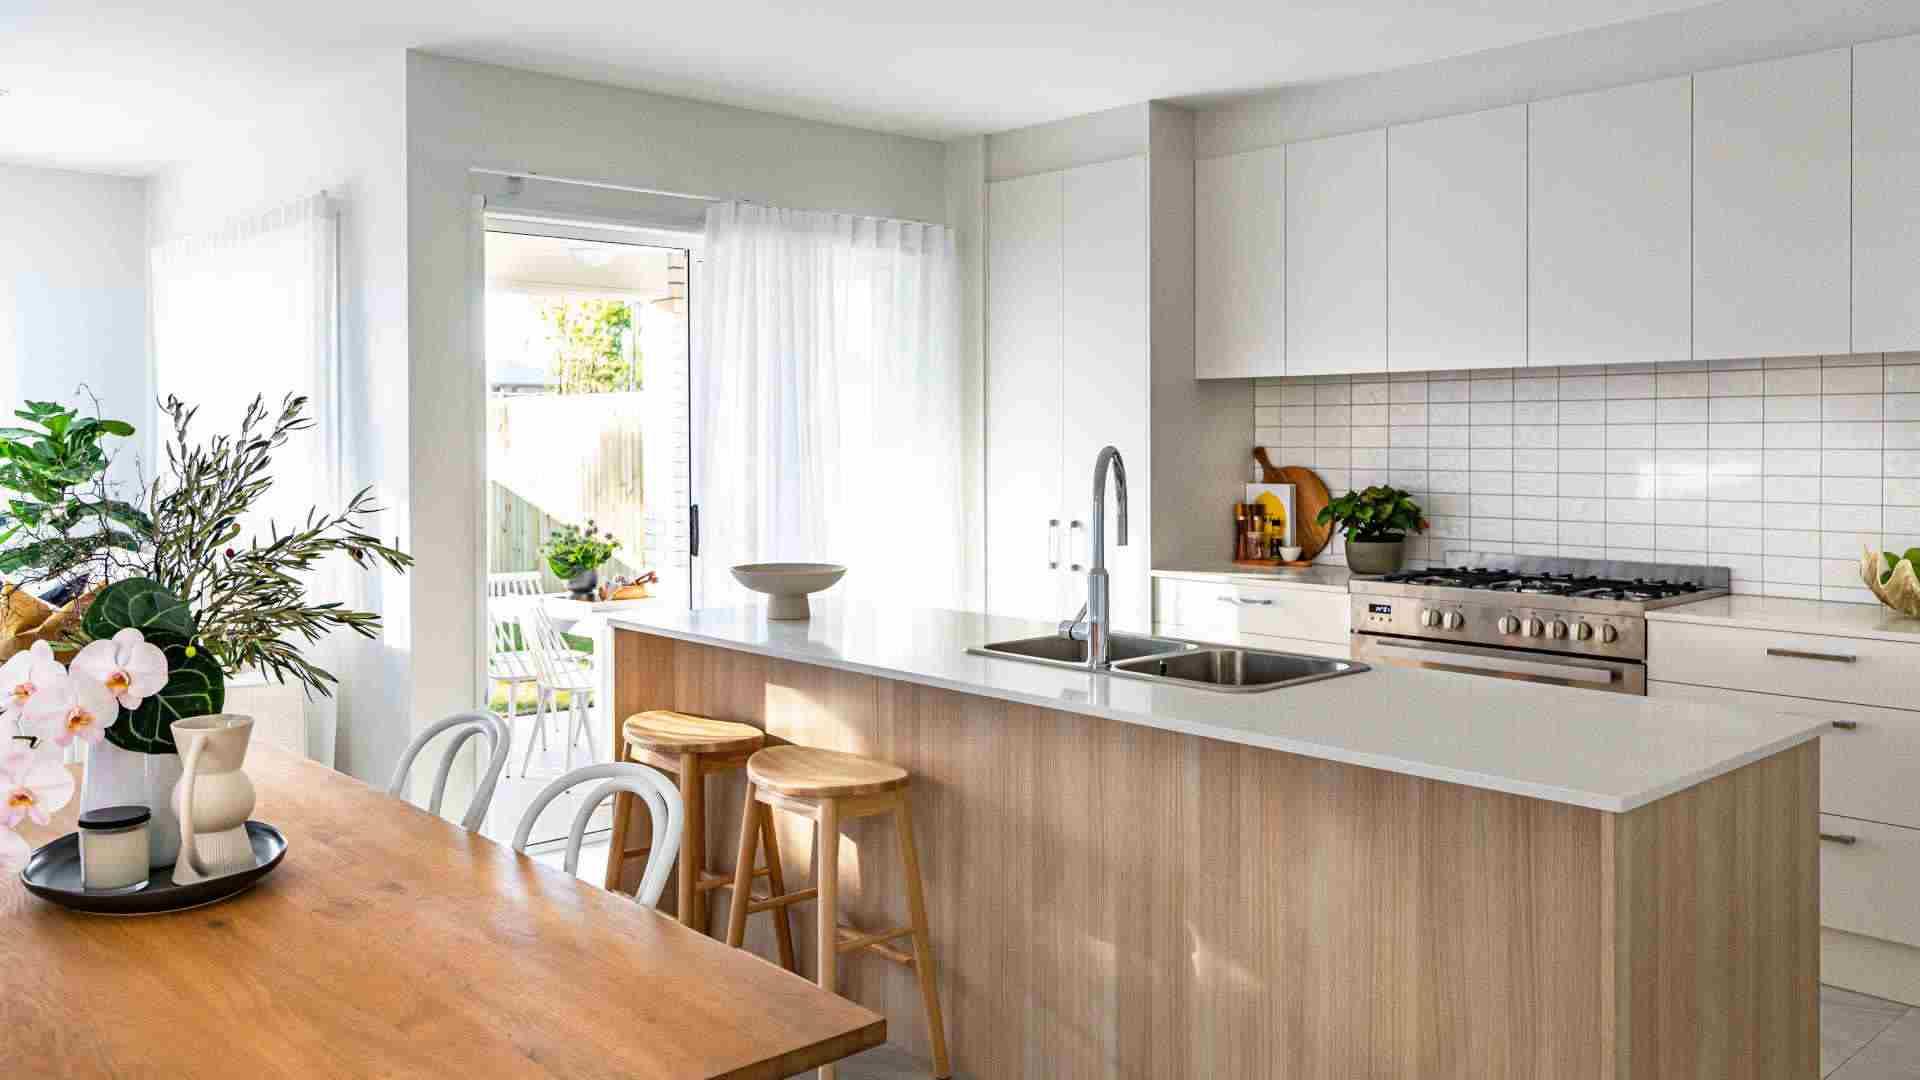 Japanese developer launches Queensland homebuilder